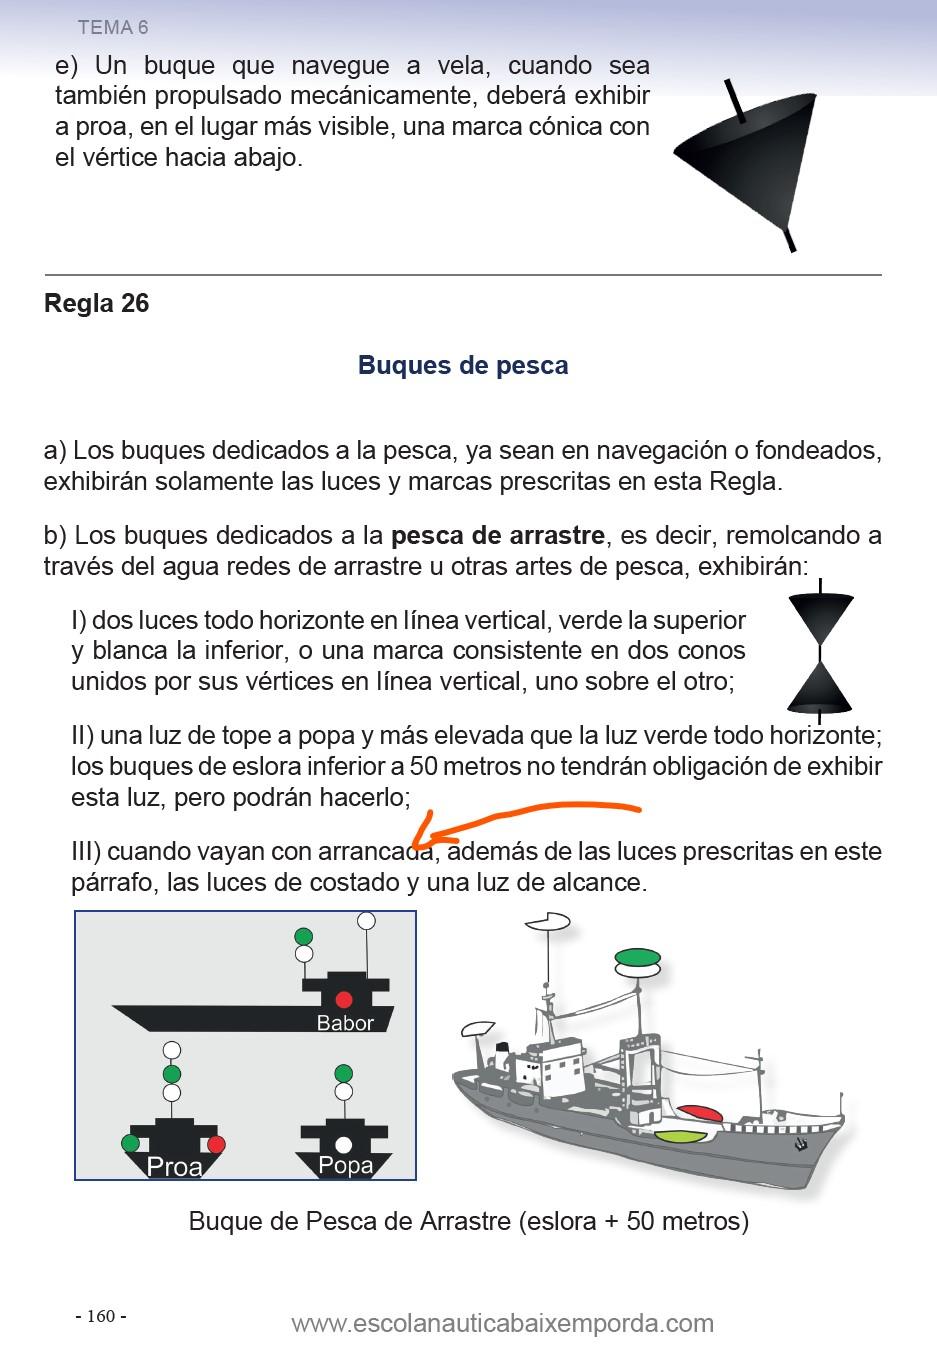 Luces de buques de pesca